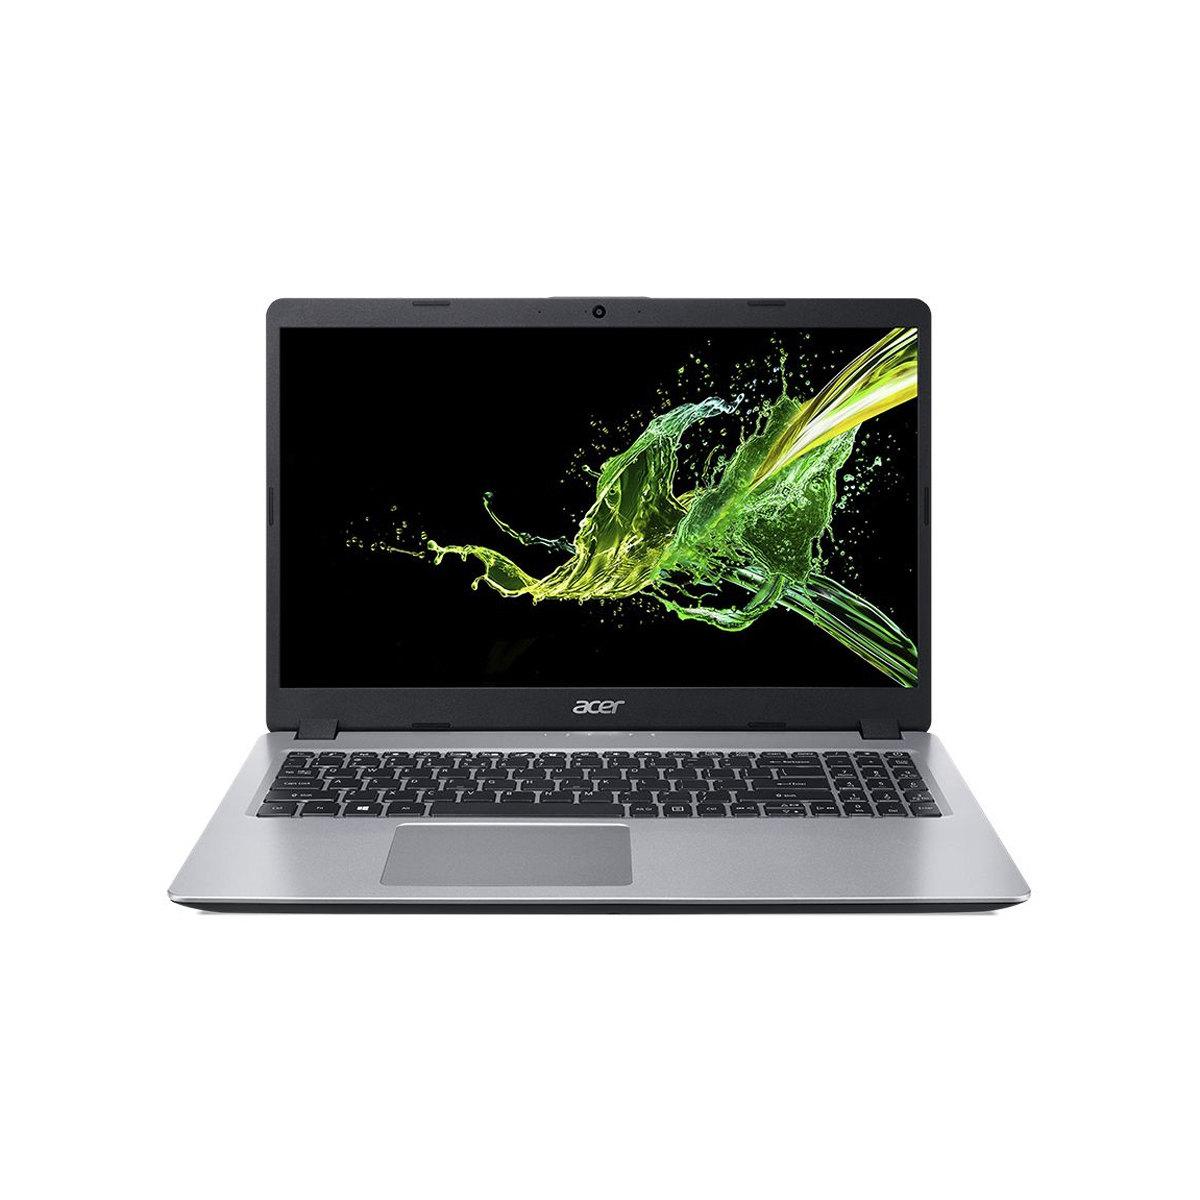 Notebook Acer A515 Core I5 8265u Memoria 4gb Ddr4 Hd 1tb Ssd 480gb Tela 15.6' Led Hd Sistema Windows 10 Home